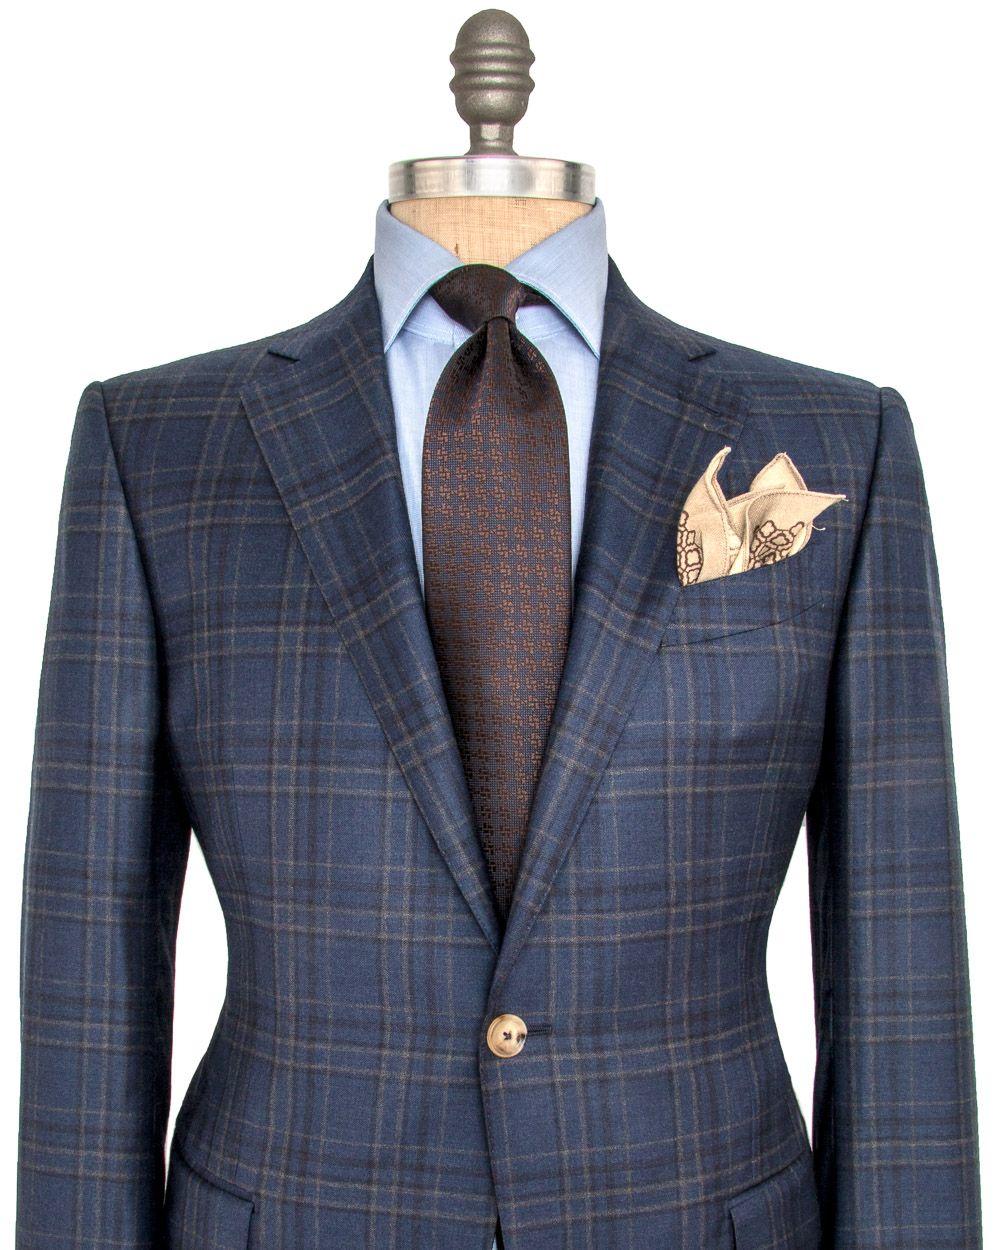 aa1aa52d Ermenegildo Zegna Navy and Tan Plaid Sportcoat 2 button jacket Notch ...